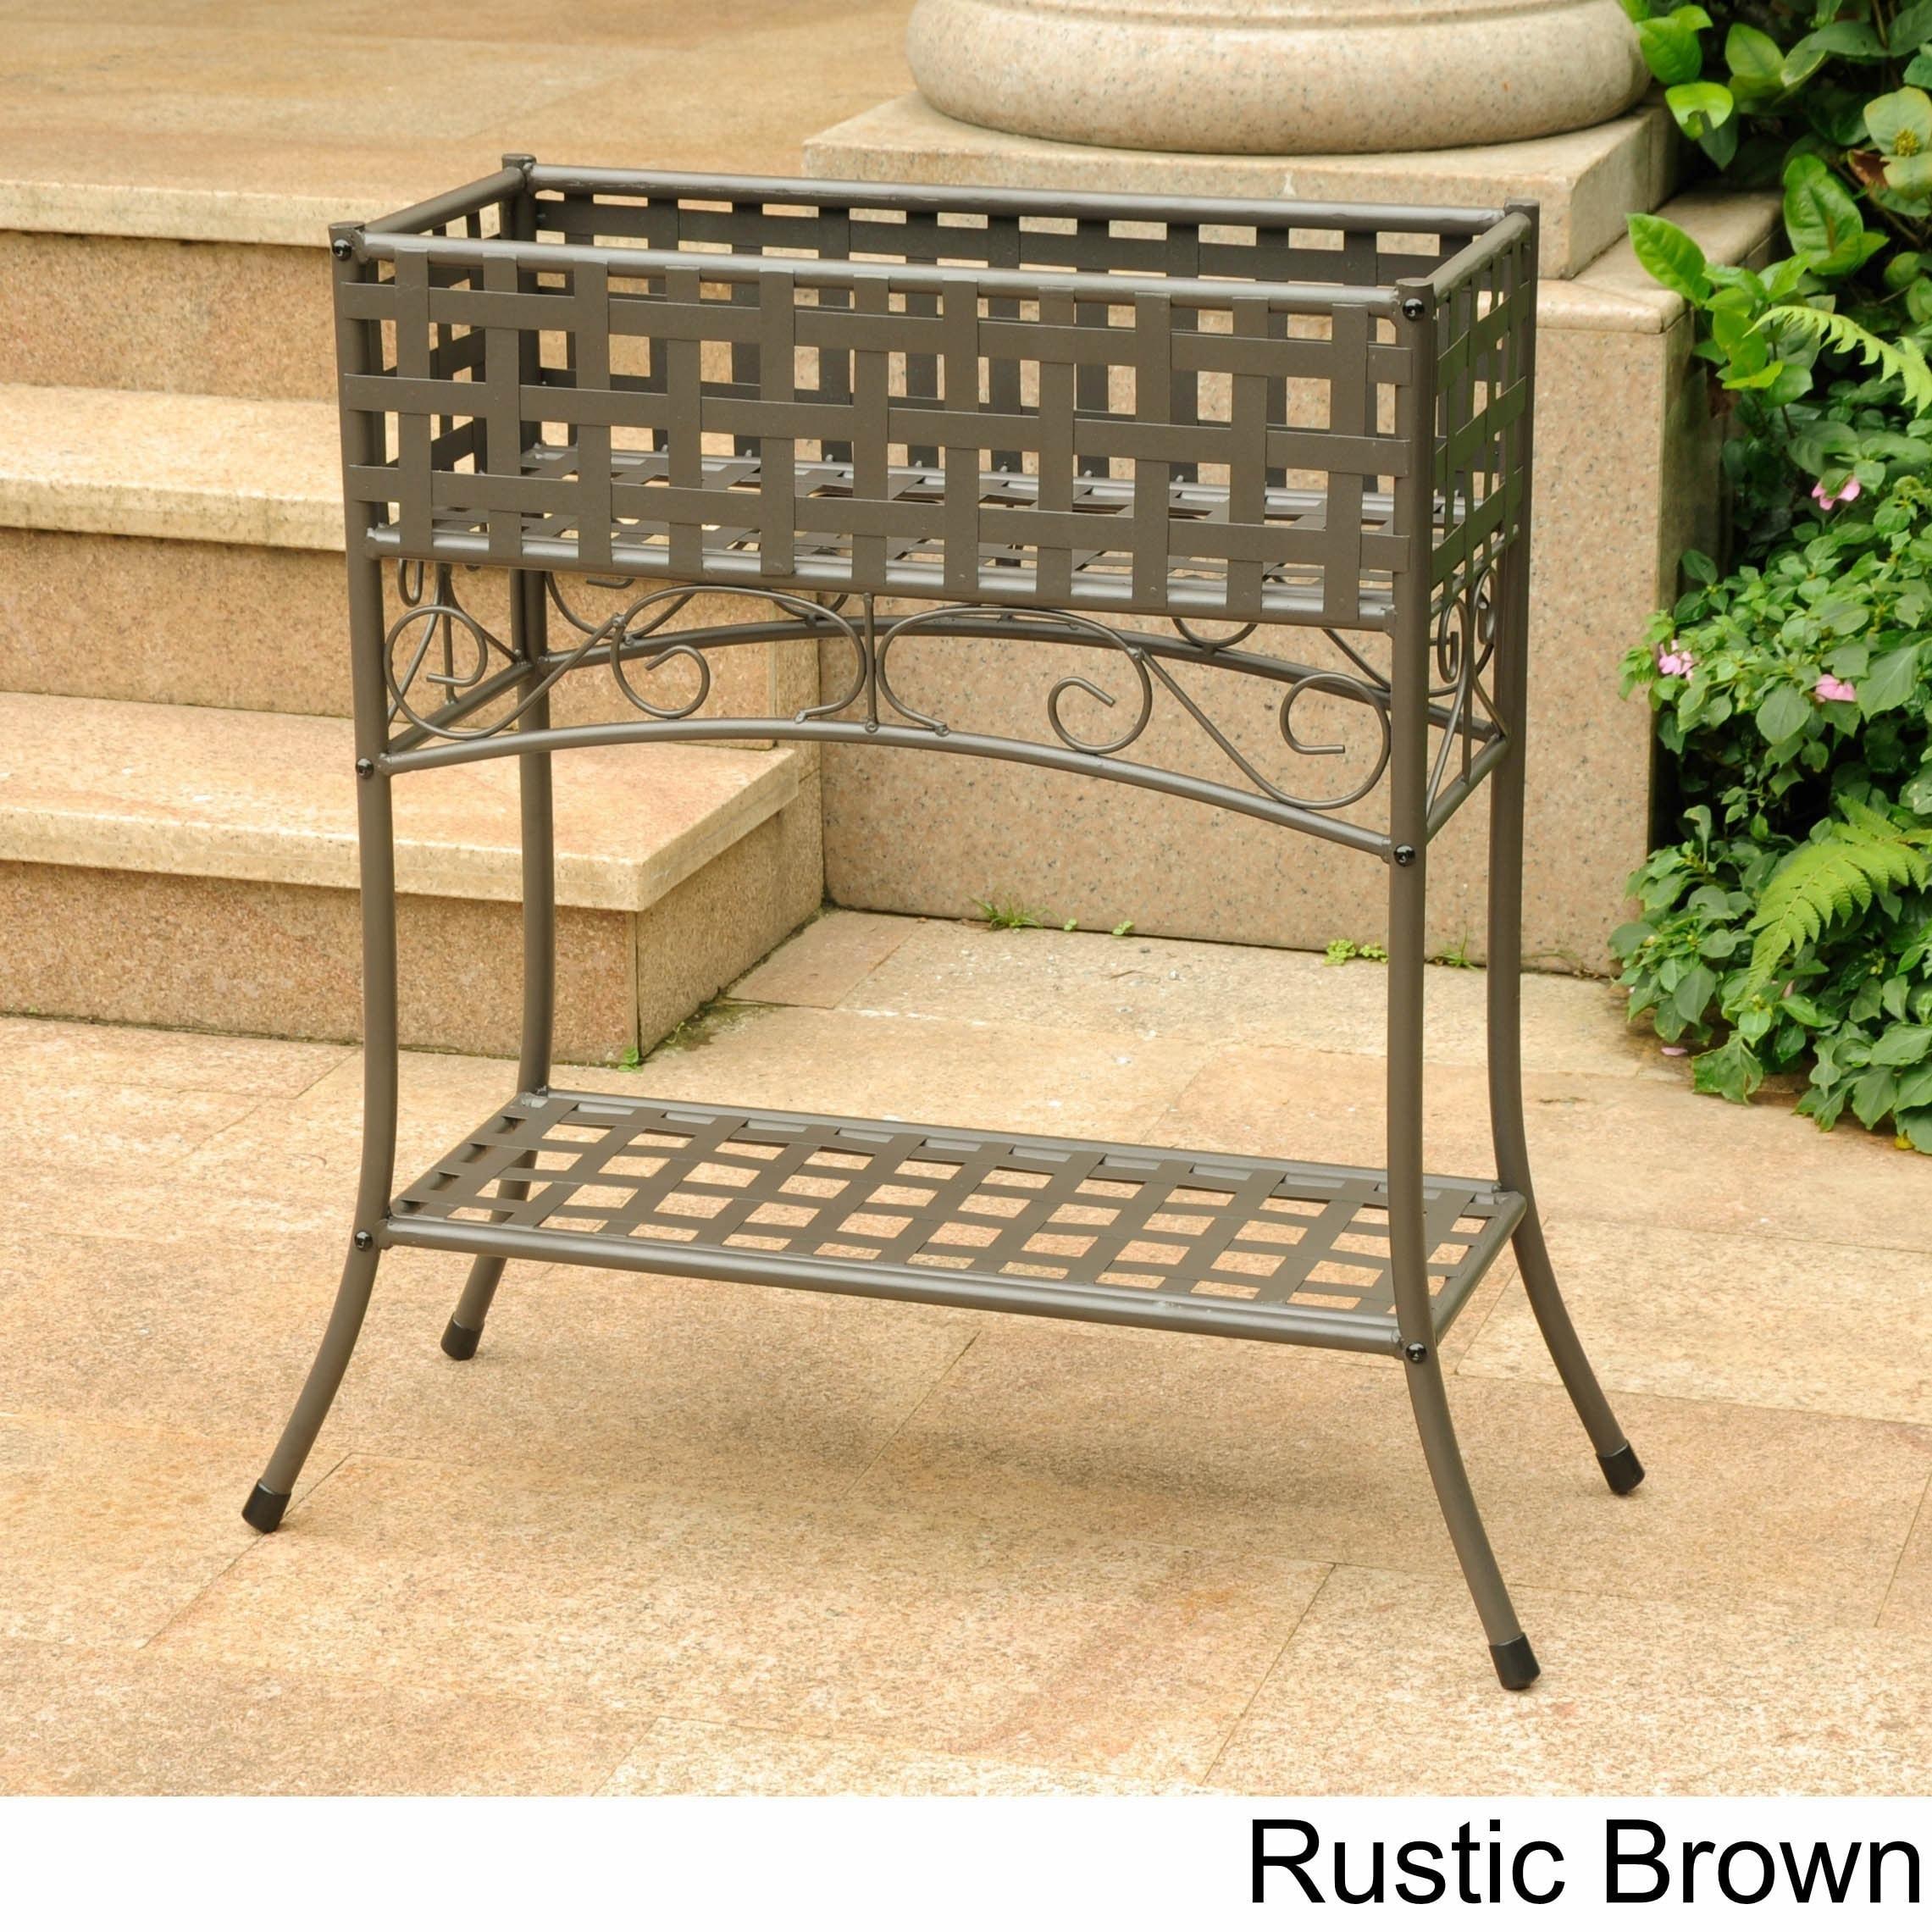 Shop international caravan rustic iron rectangular plant stand free shipping today overstock com 1789932